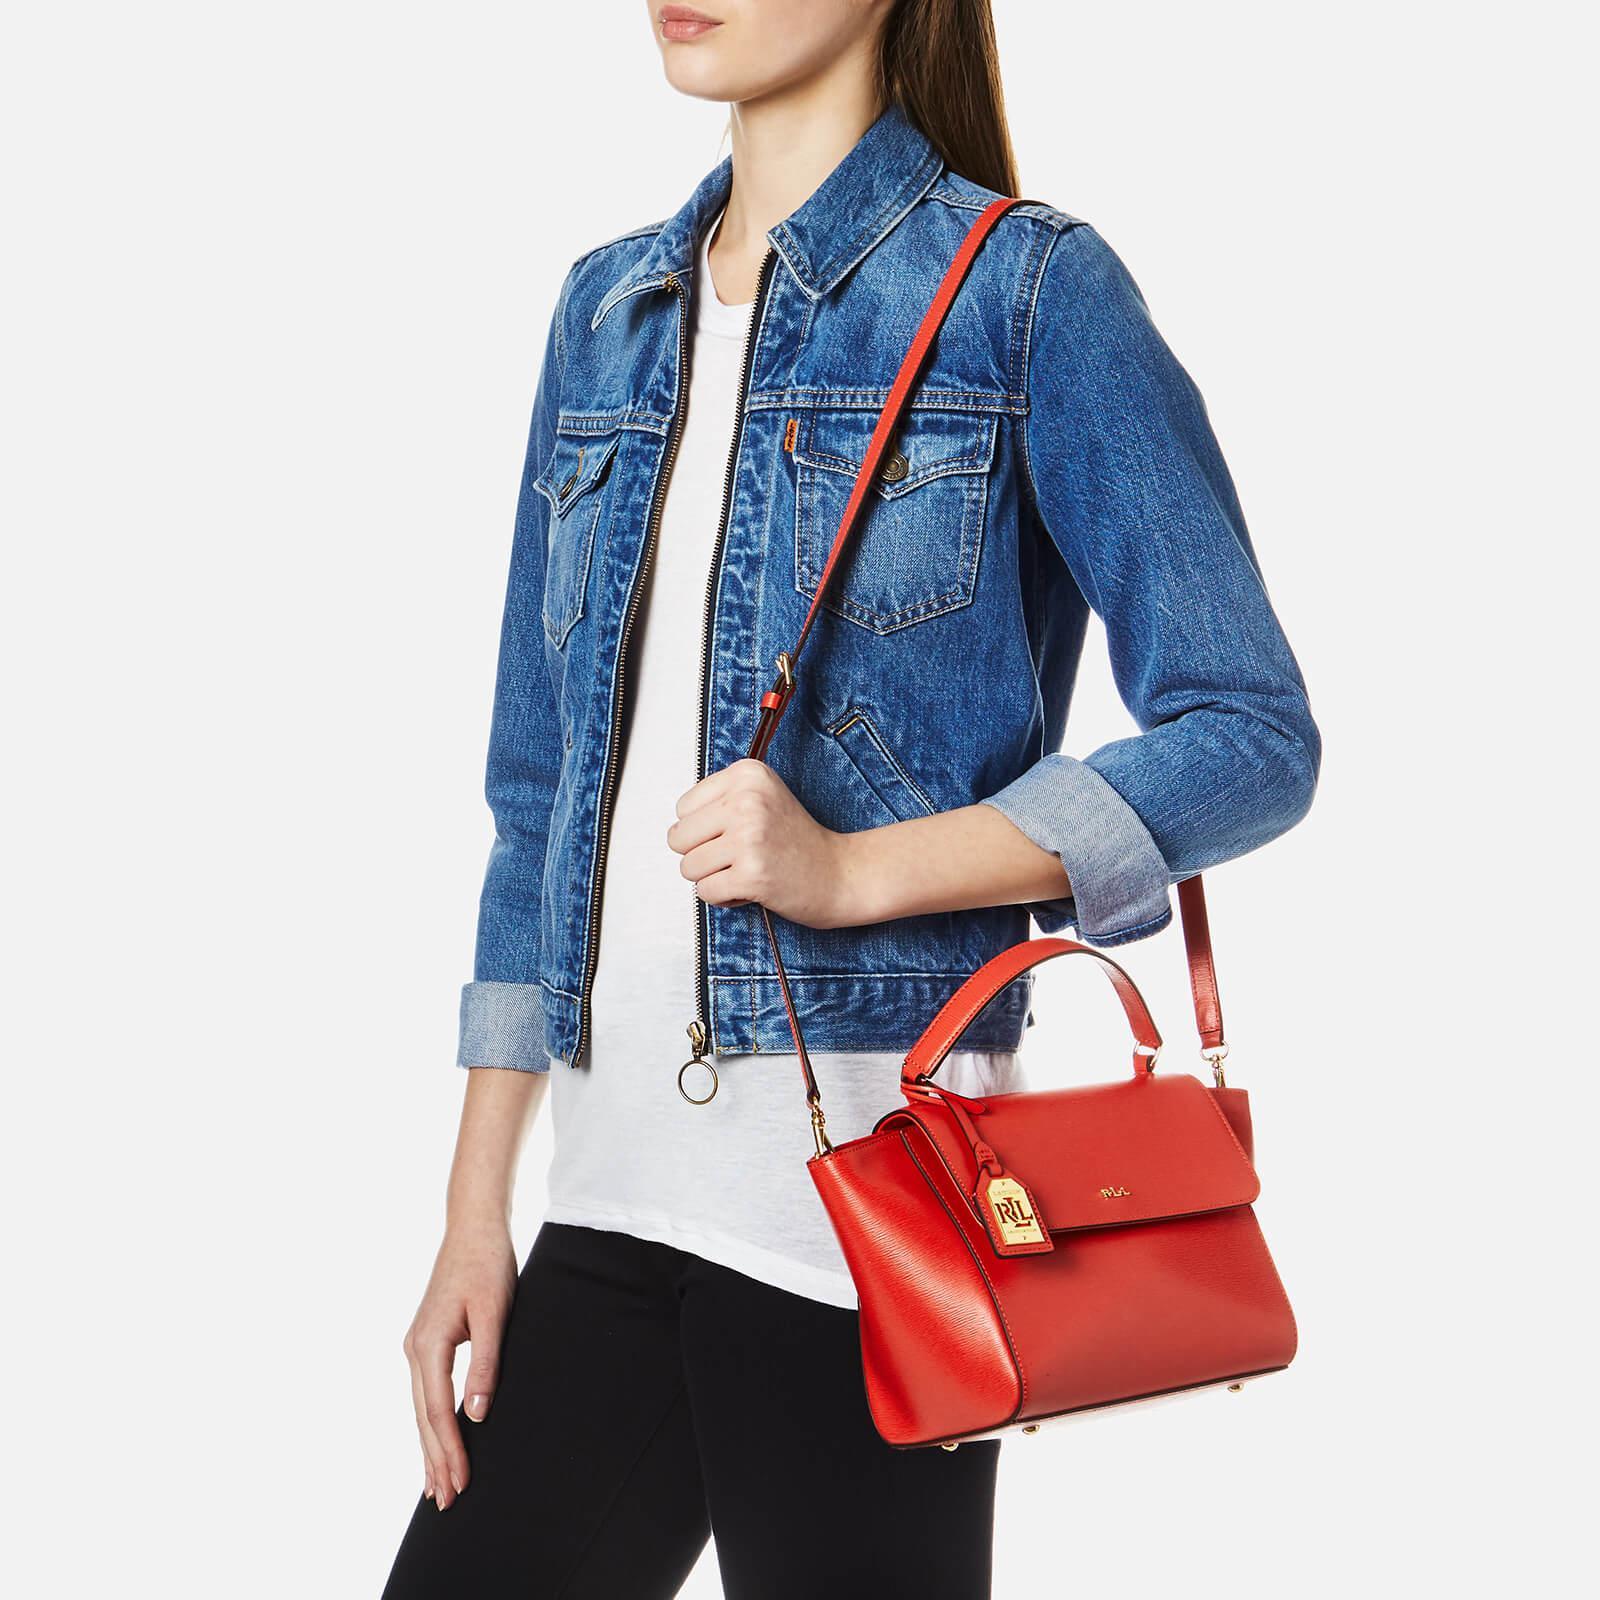 bcf5e675f Ralph Lauren Barclay Cross Body Bag in Red - Lyst